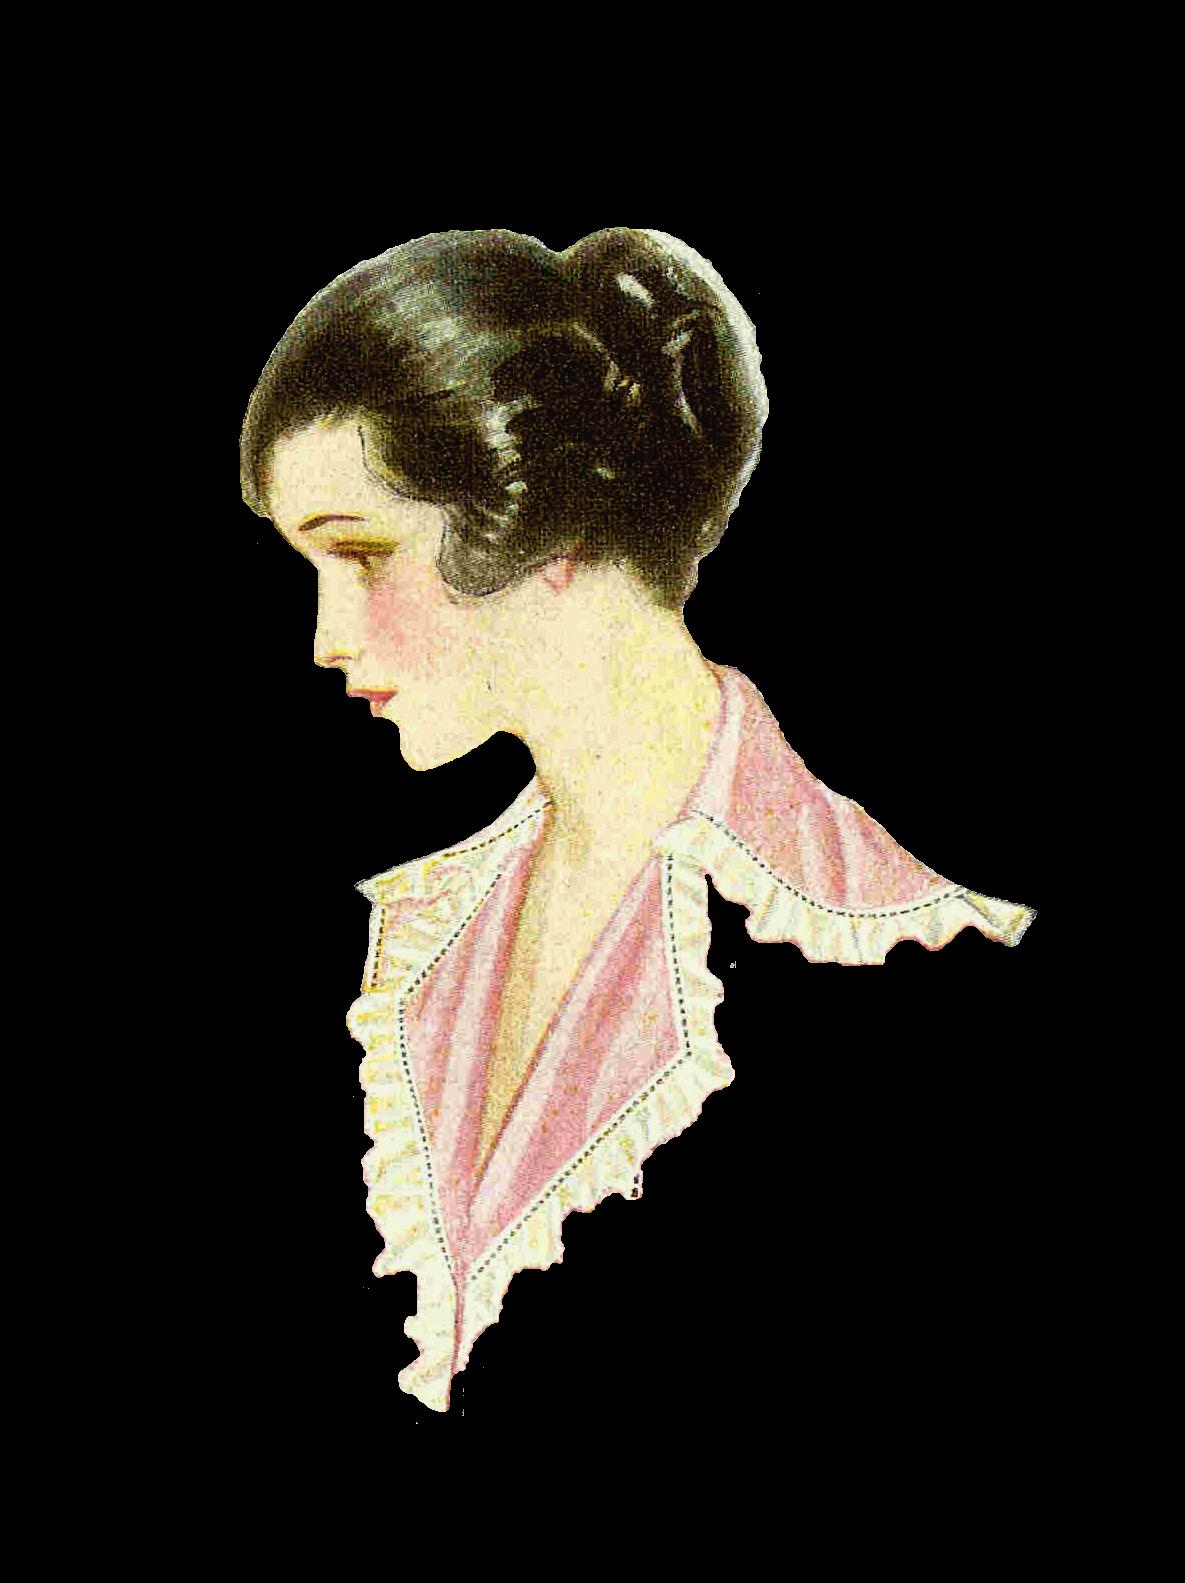 Antique Images: Free Vintage Fashion Graphic: 1915 Women's